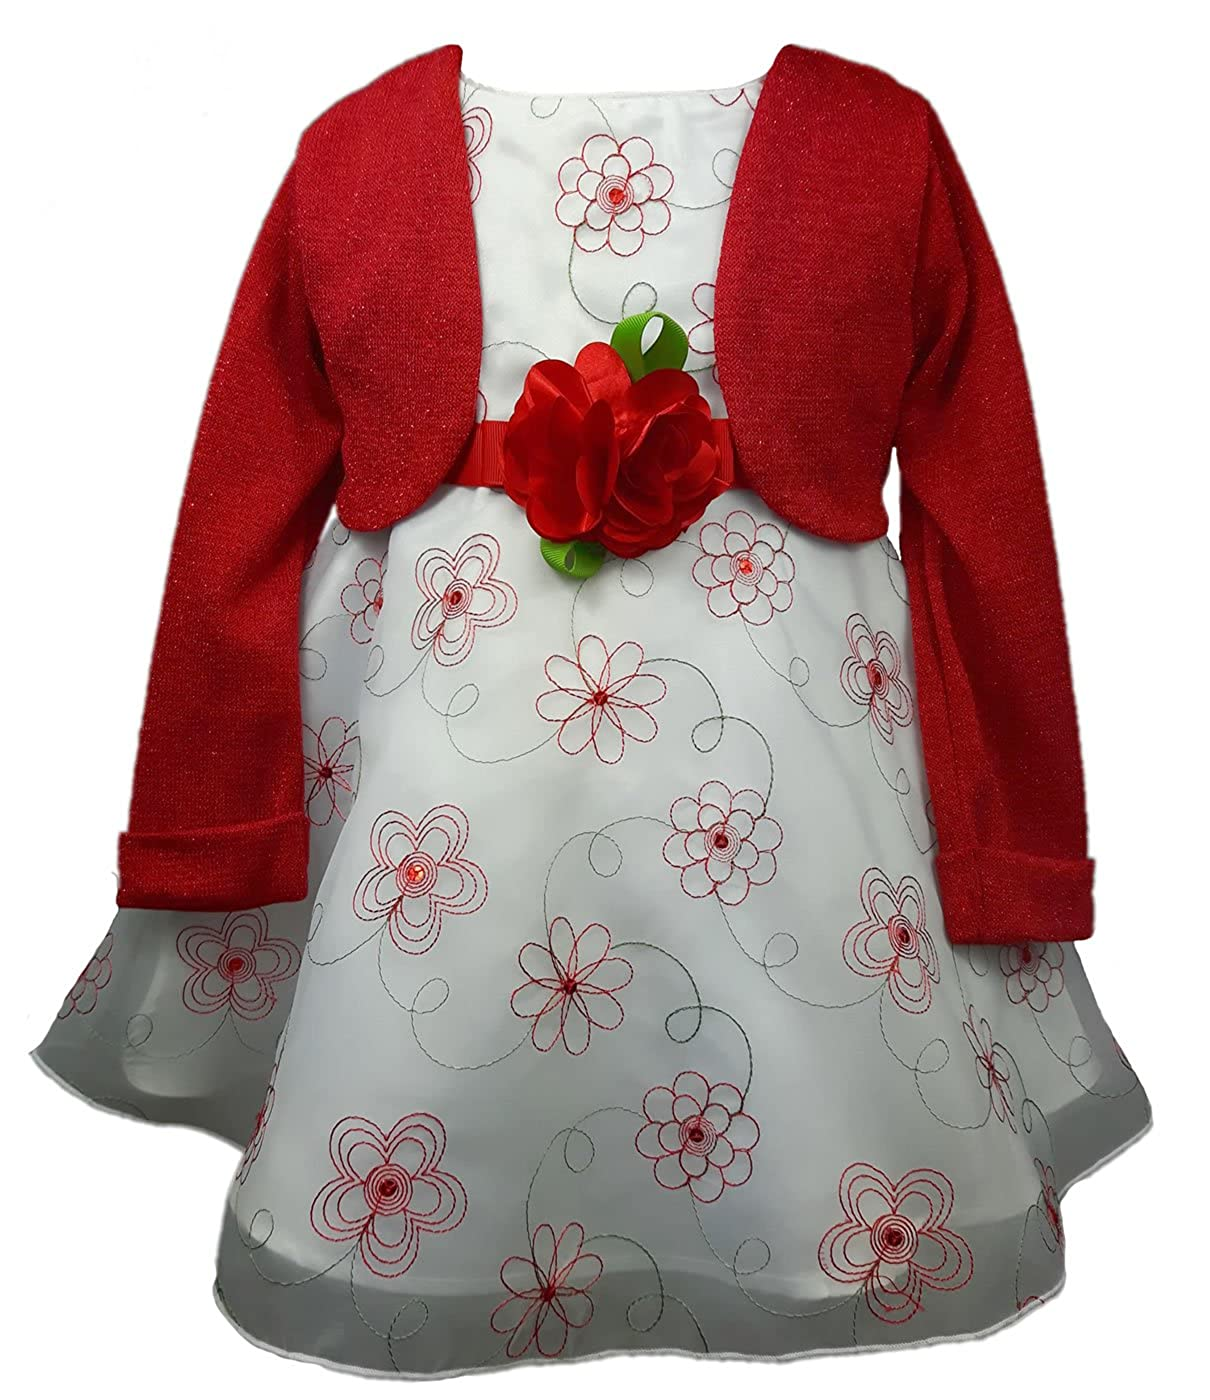 56,62,68,74,80,86 TrendyDress Traum Baby M/ädchen Kleid 3D Petticoatkleid Taufkleid inkl Strick-Bolero Gr